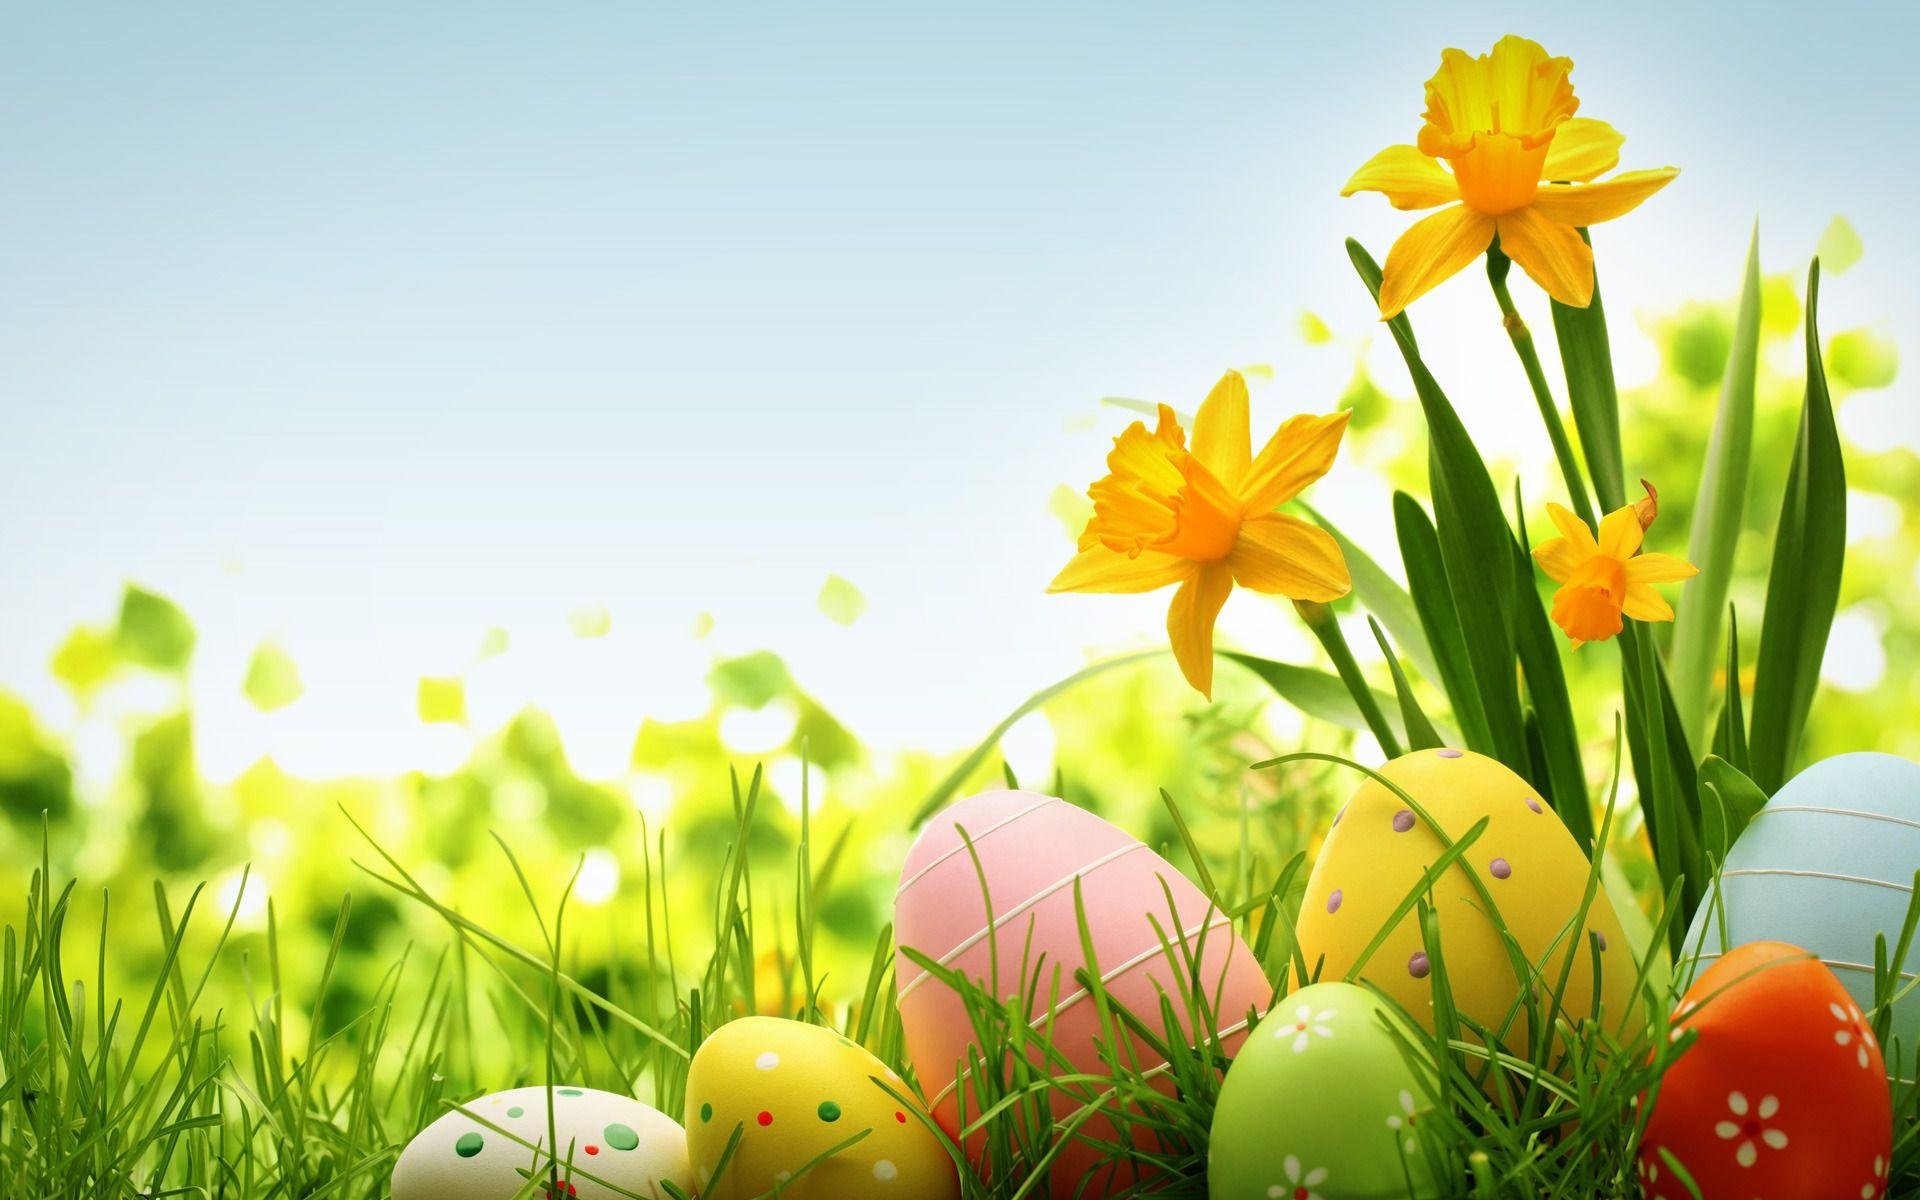 Easter Bunny Wallpaper Easter Wallpaper Easter Photography Happy Easter Wallpaper